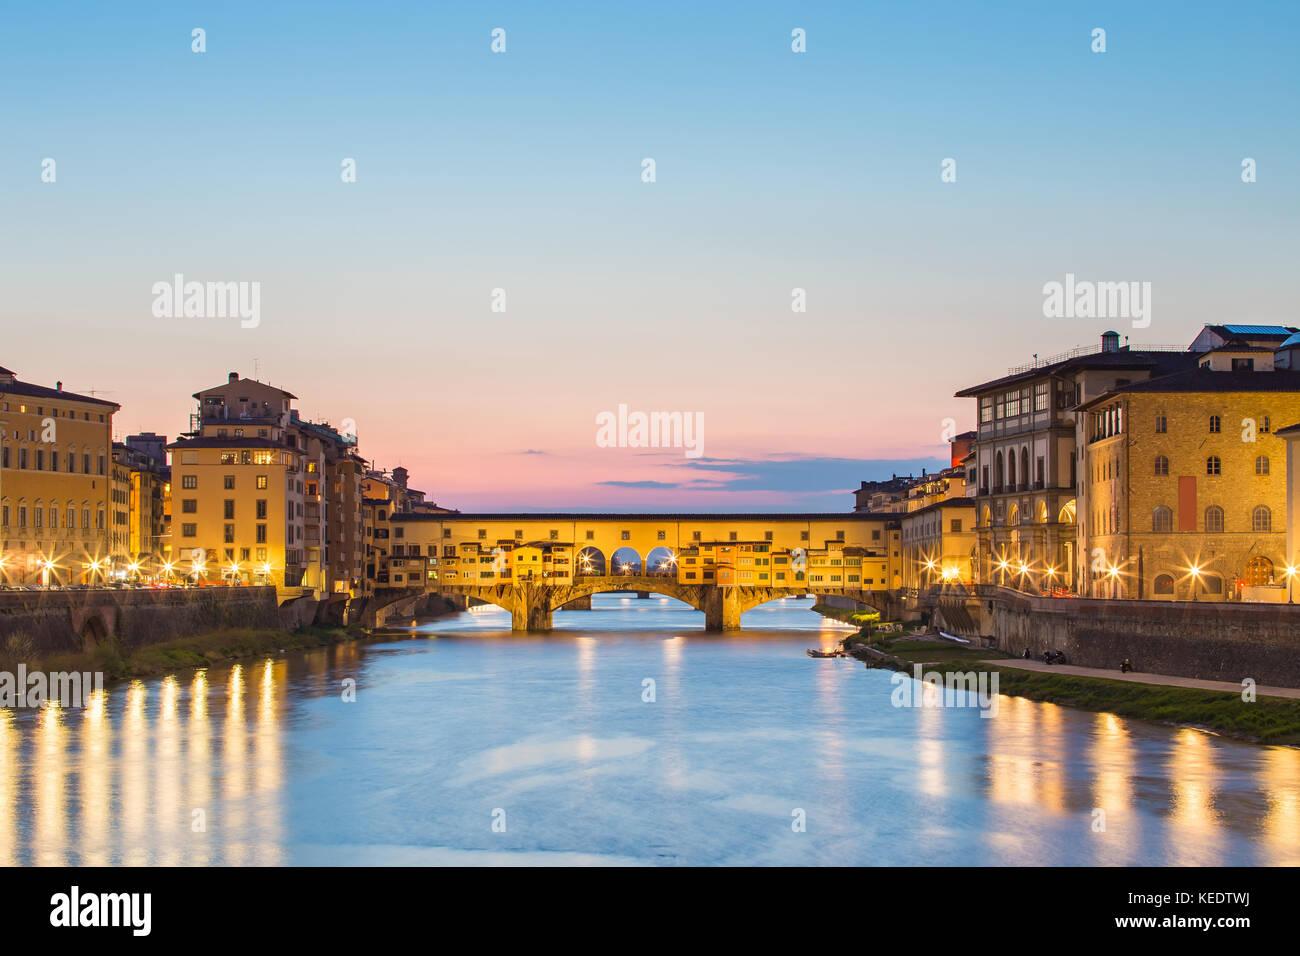 Ponte Vecchio bridge at night in Florence, Tuscany, Italy. - Stock Image